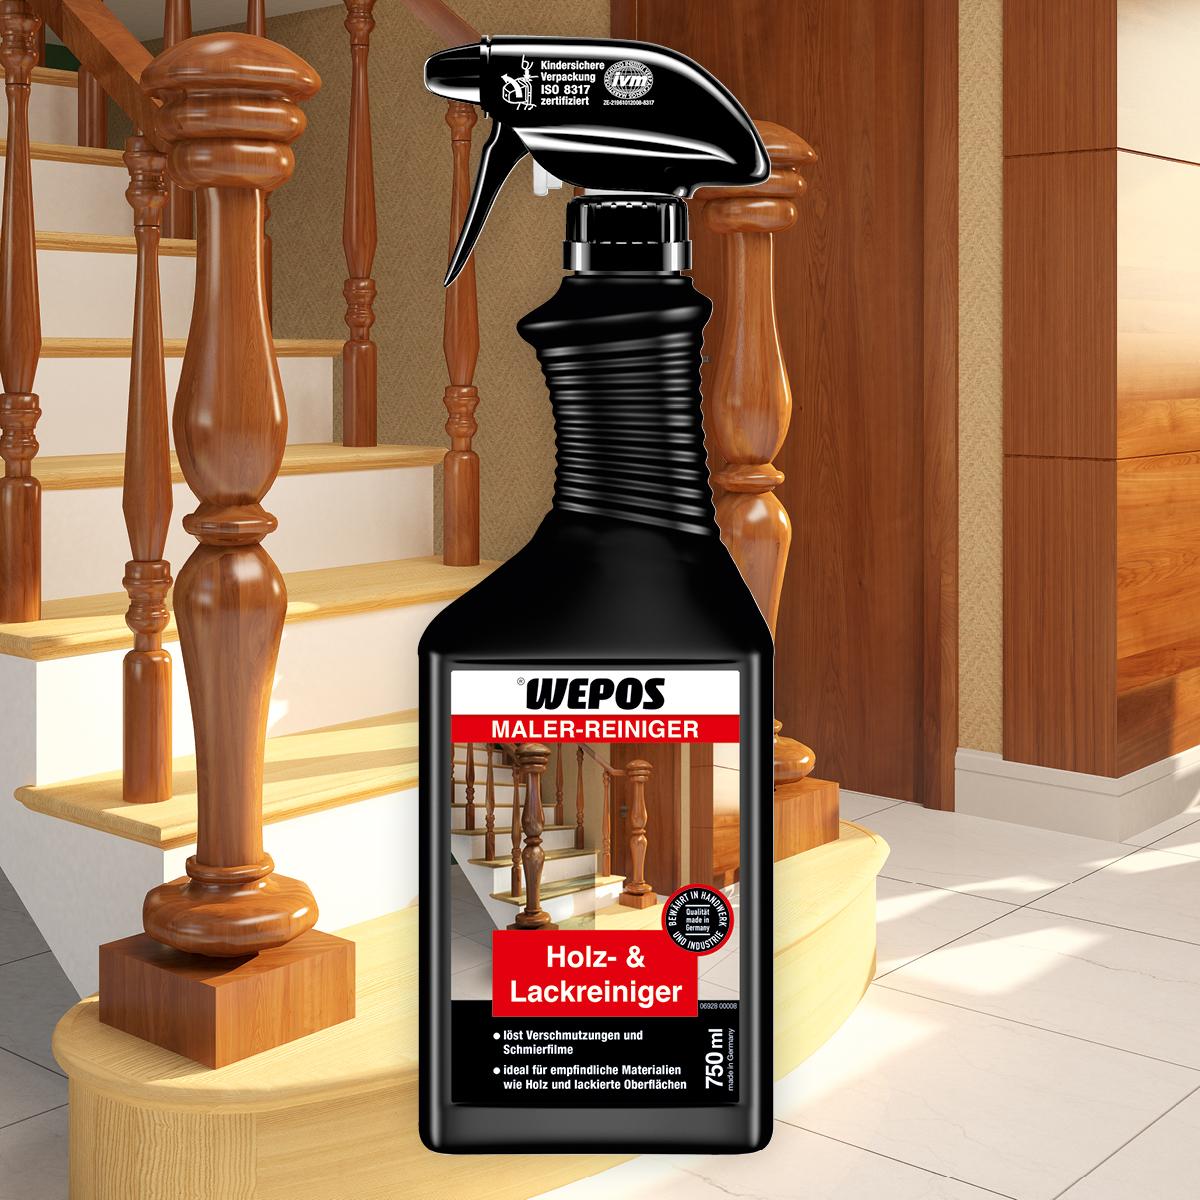 Maler-Reiniger Holz- & Lackreiniger 750 ml